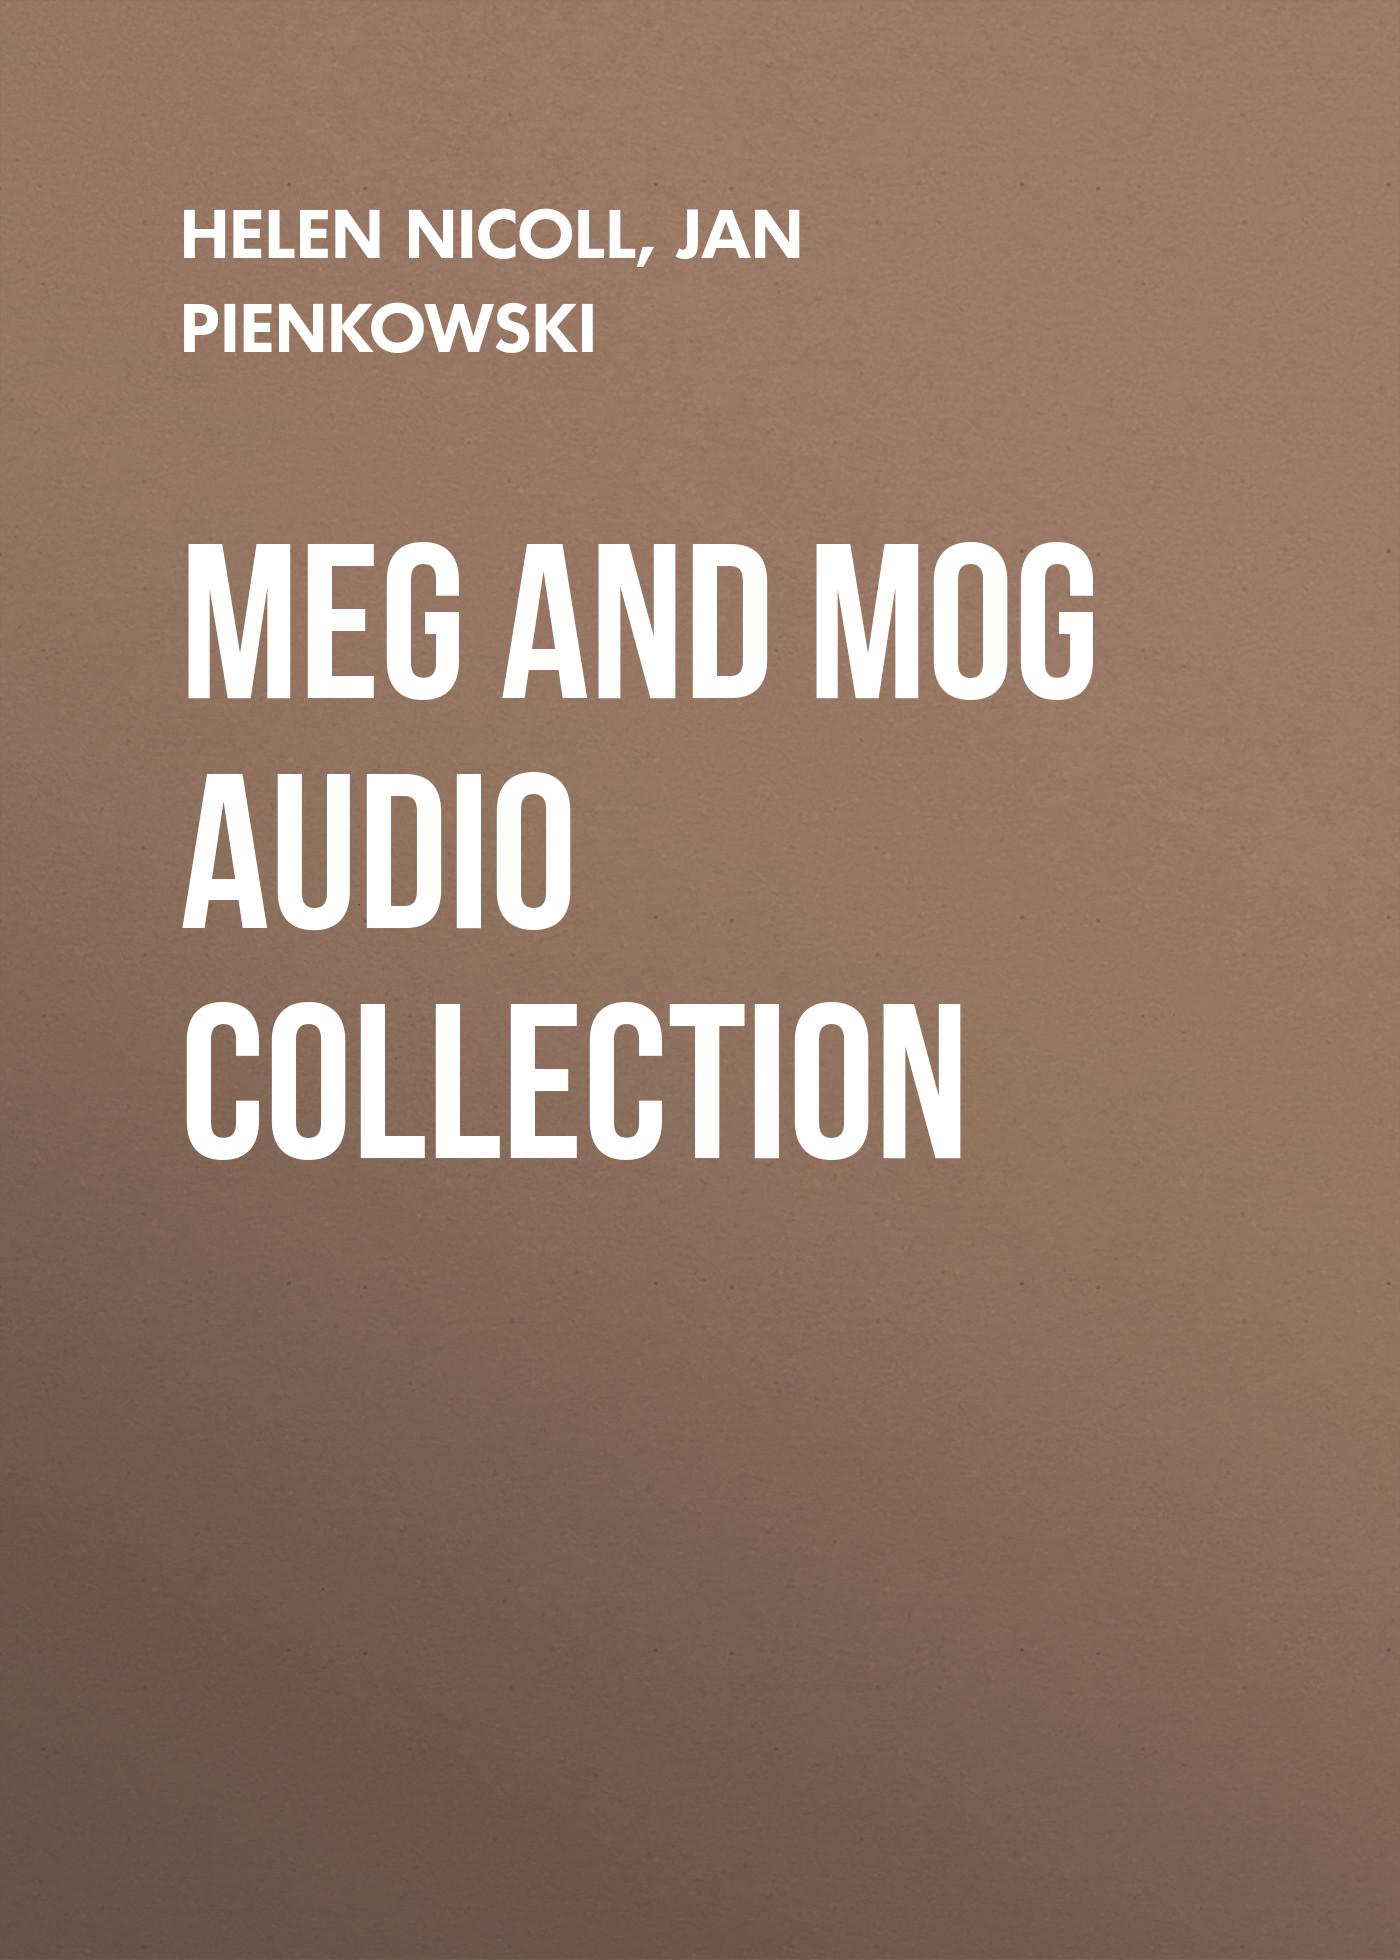 Helen Nicoll Meg and Mog Audio Collection david wood meg and mog show